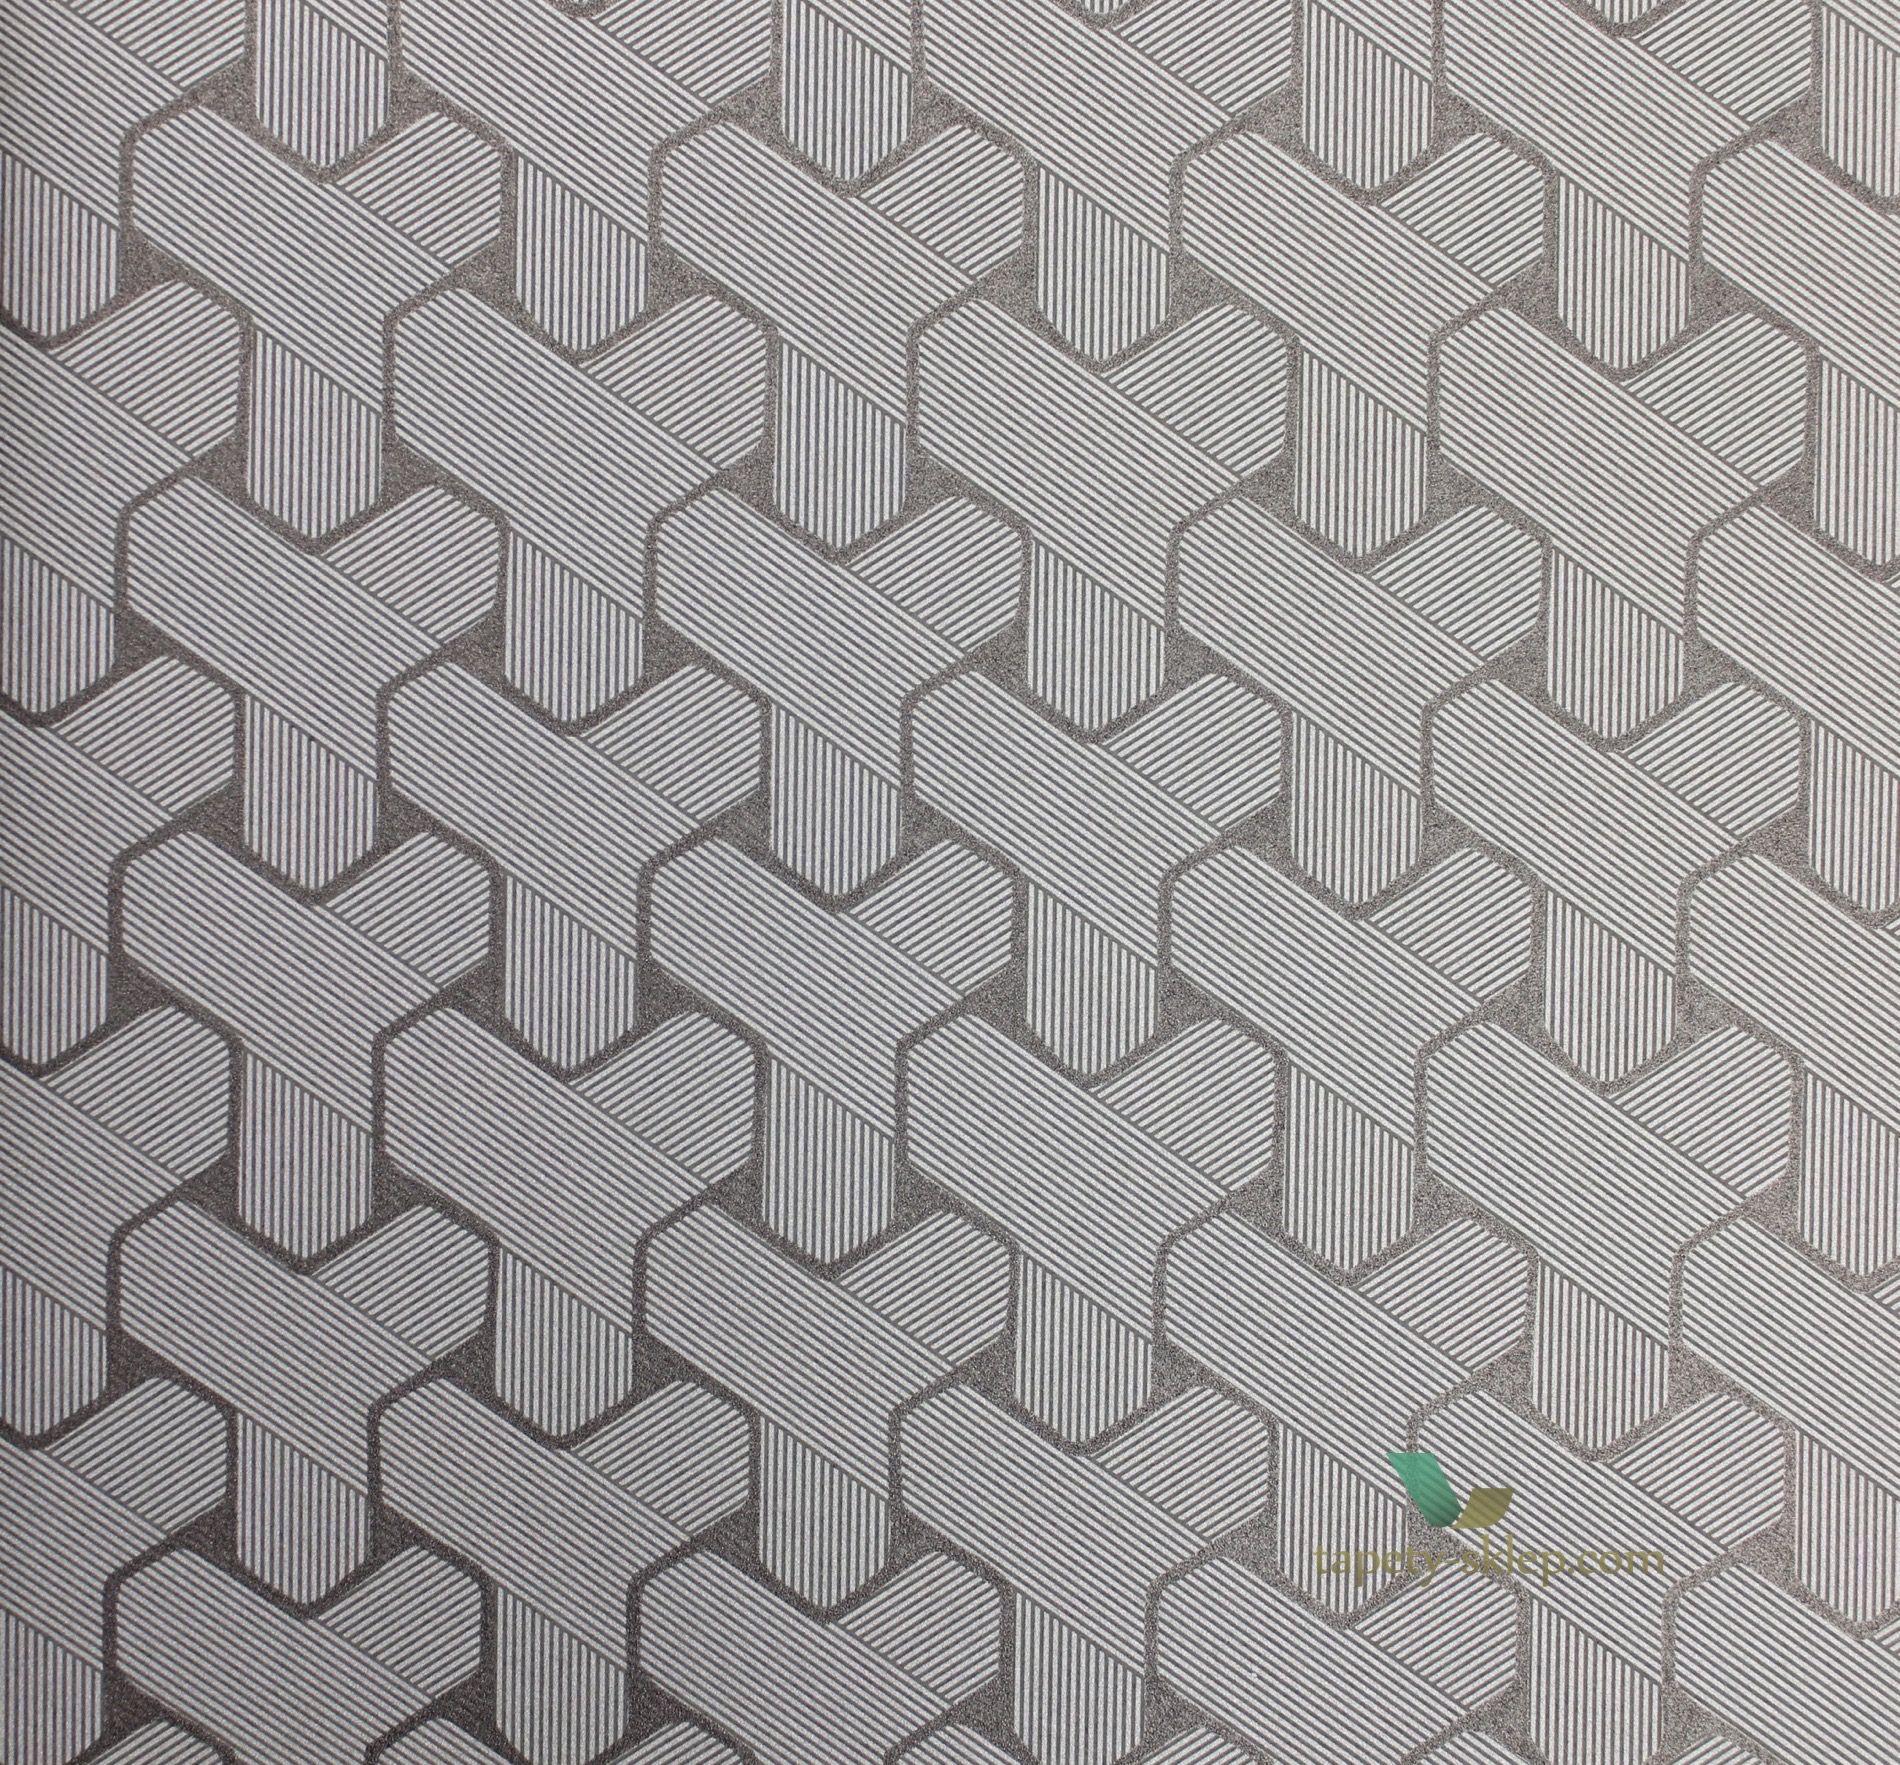 461 tapeta hooked on walls 66533 ypsilon gentle groove - gentle, Wohnzimmer dekoo